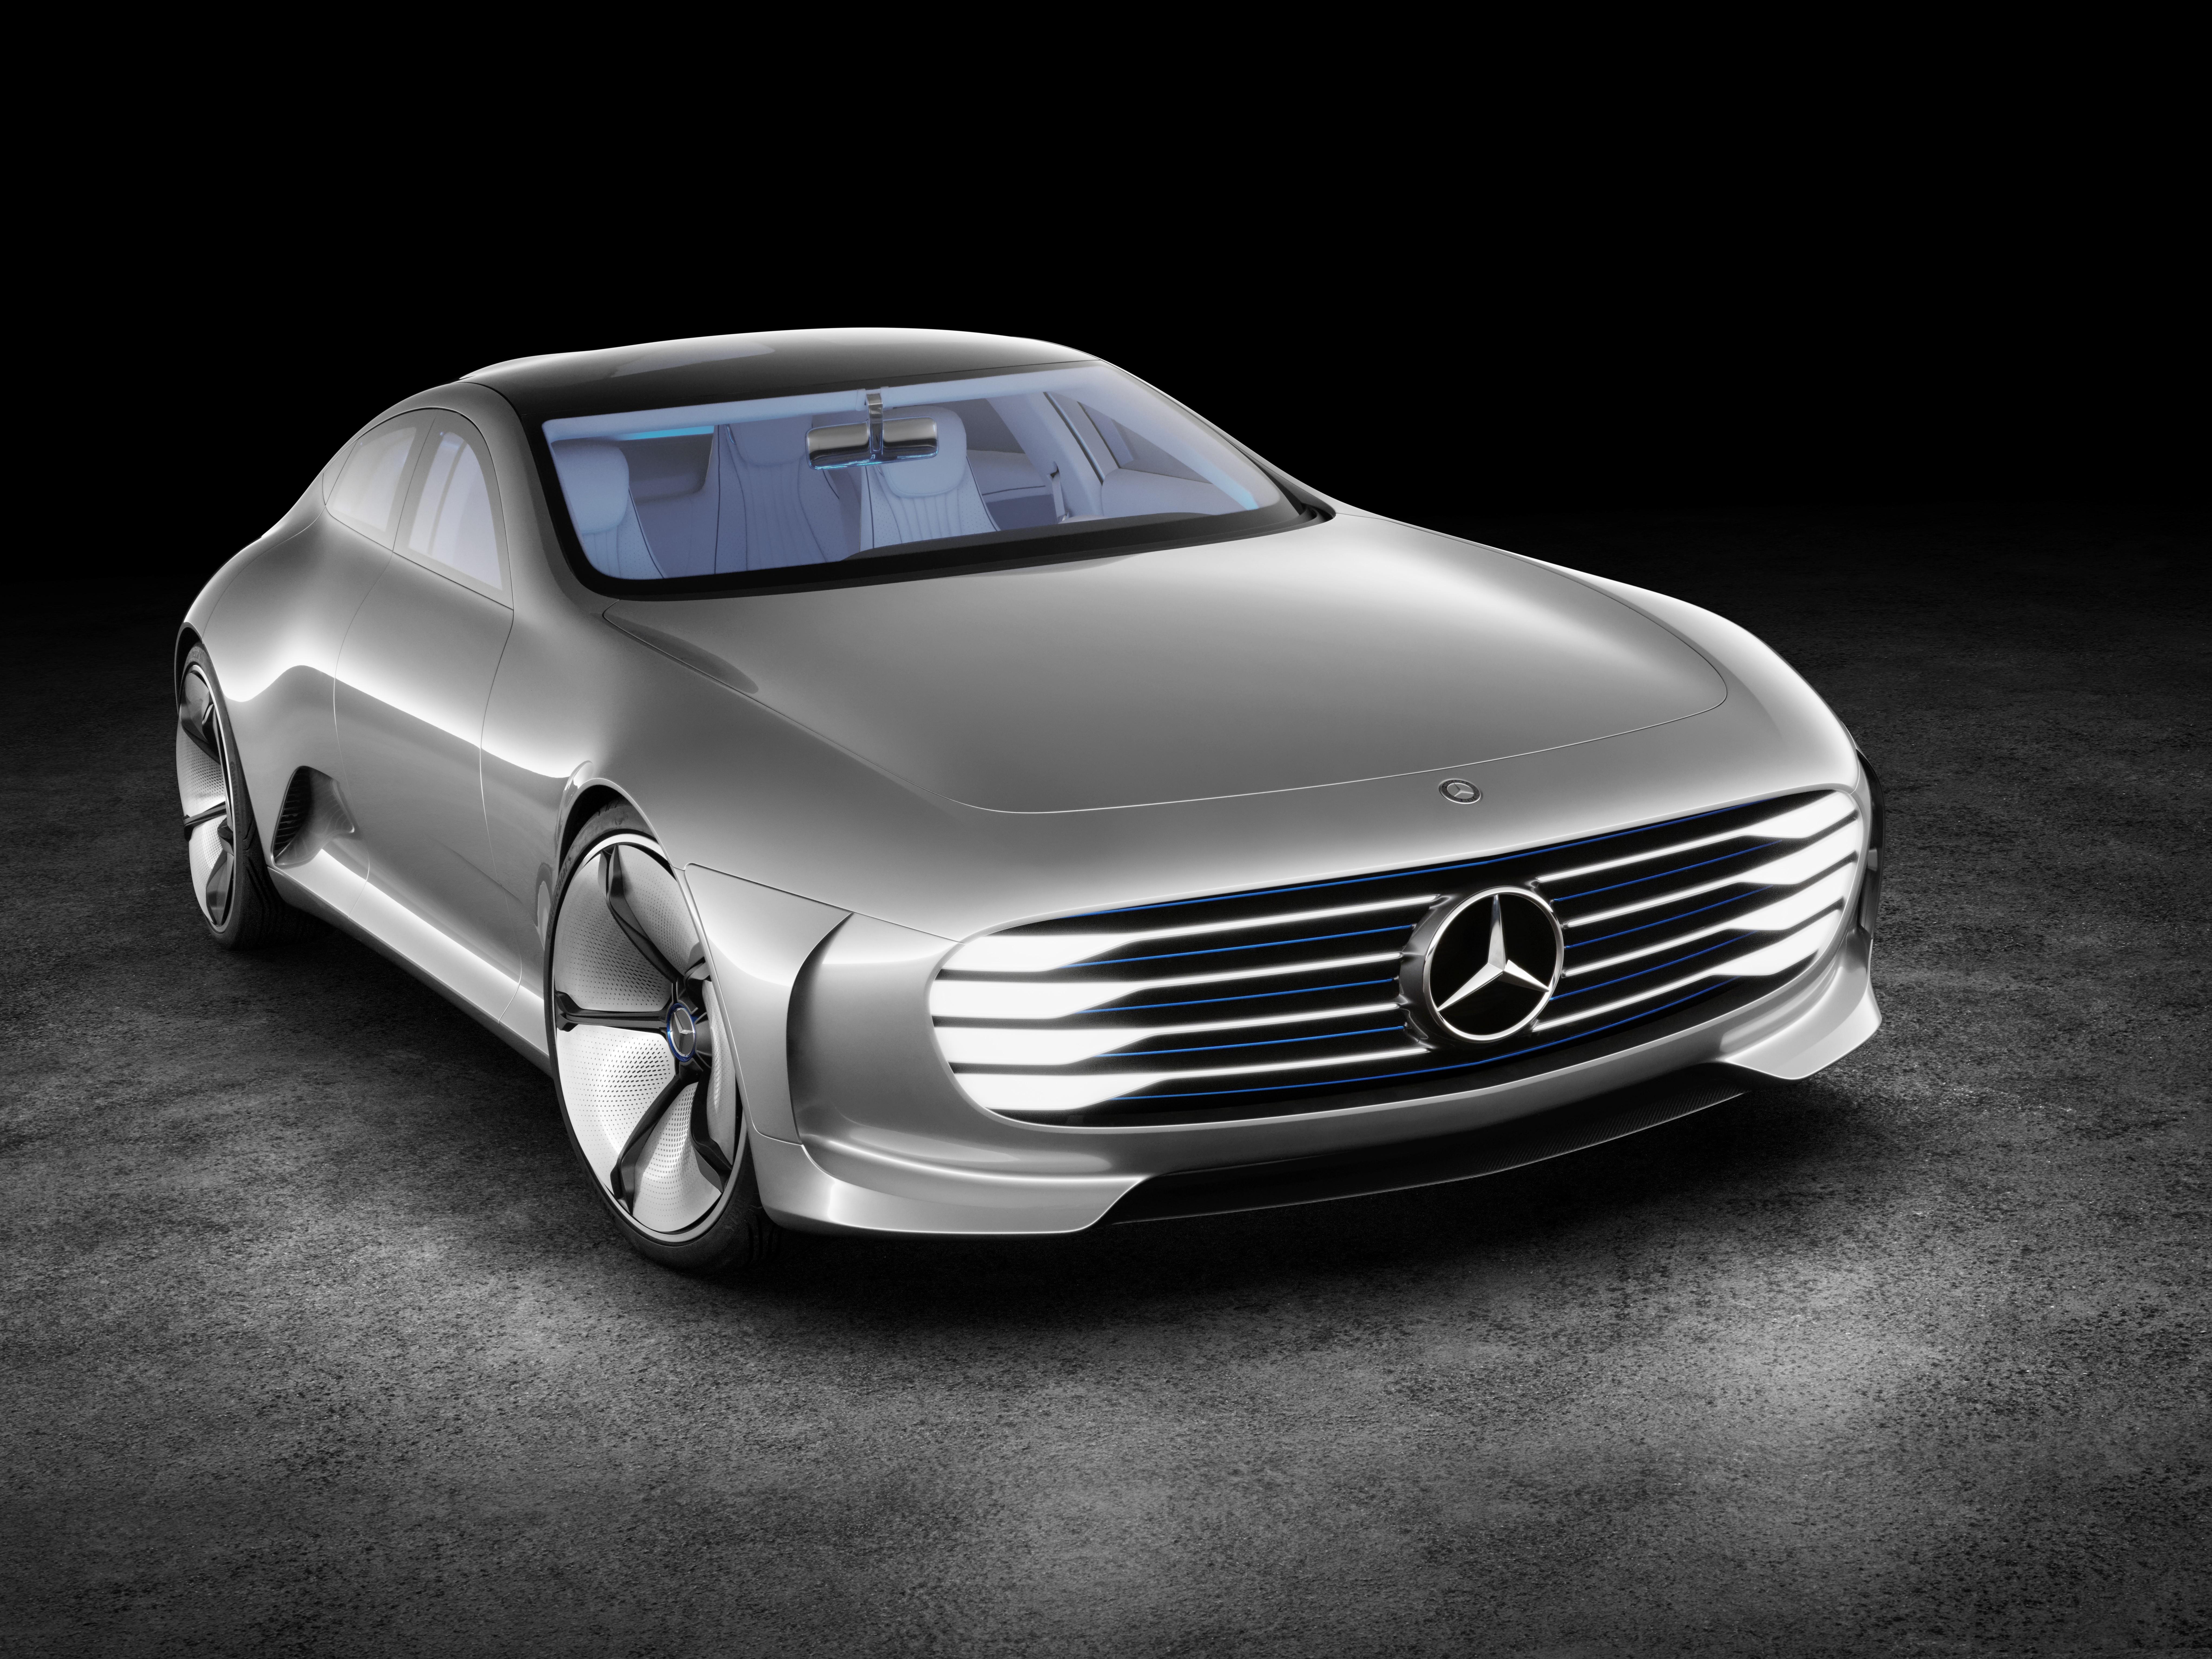 New mercedes amg concept confirmed for 2017 geneva motor for New mercedes benz concept